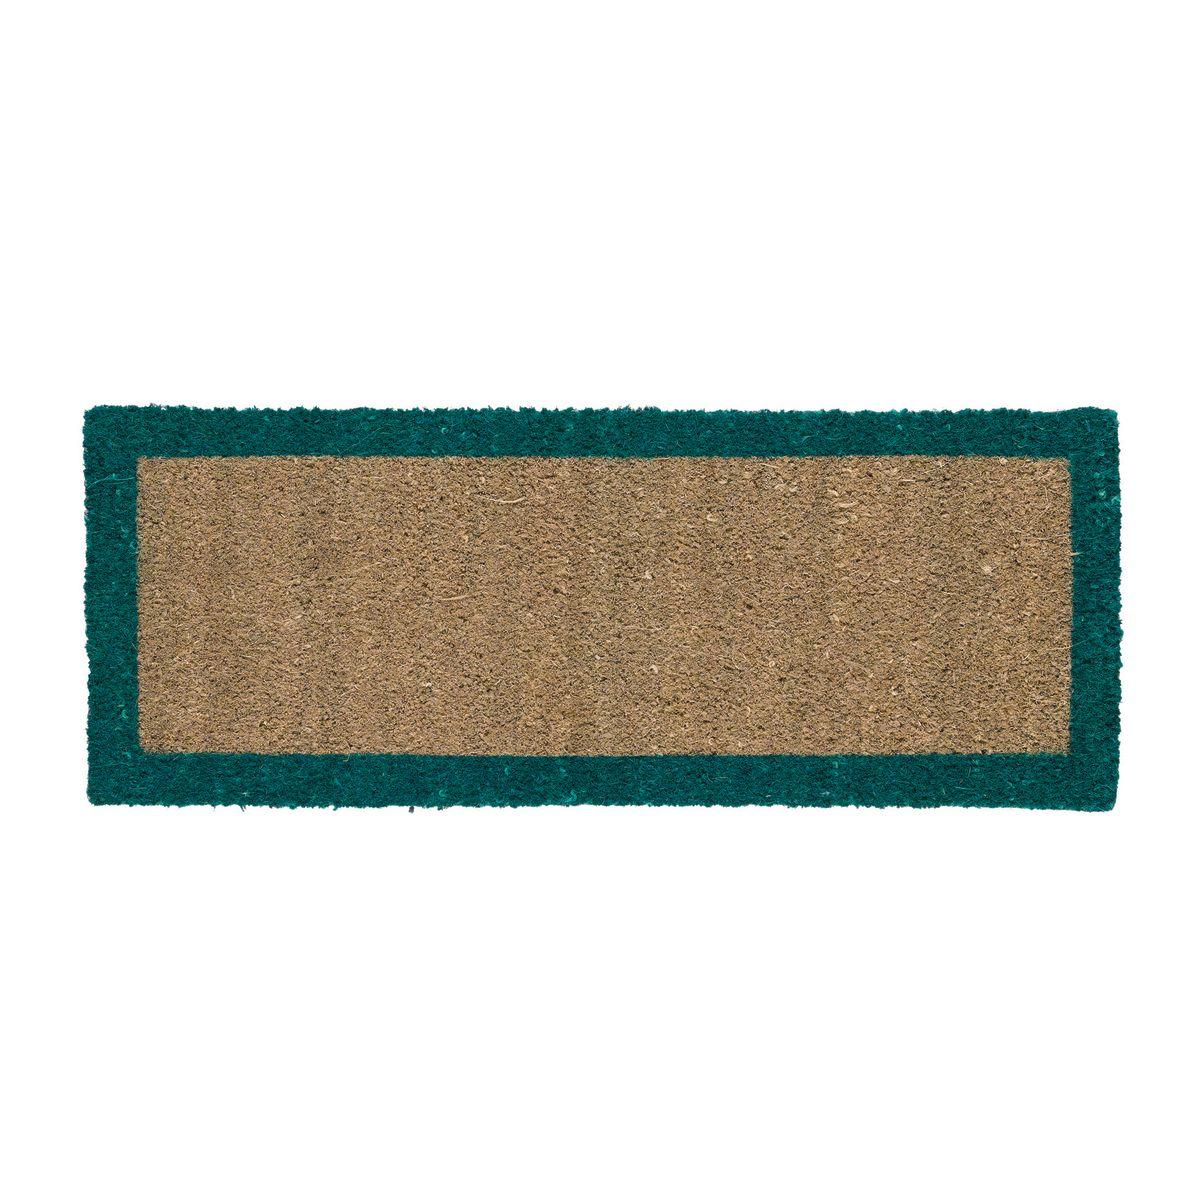 Zerbino bordo verde 25 x 50 cm prezzi e offerte online for Copriwater leroy merlin